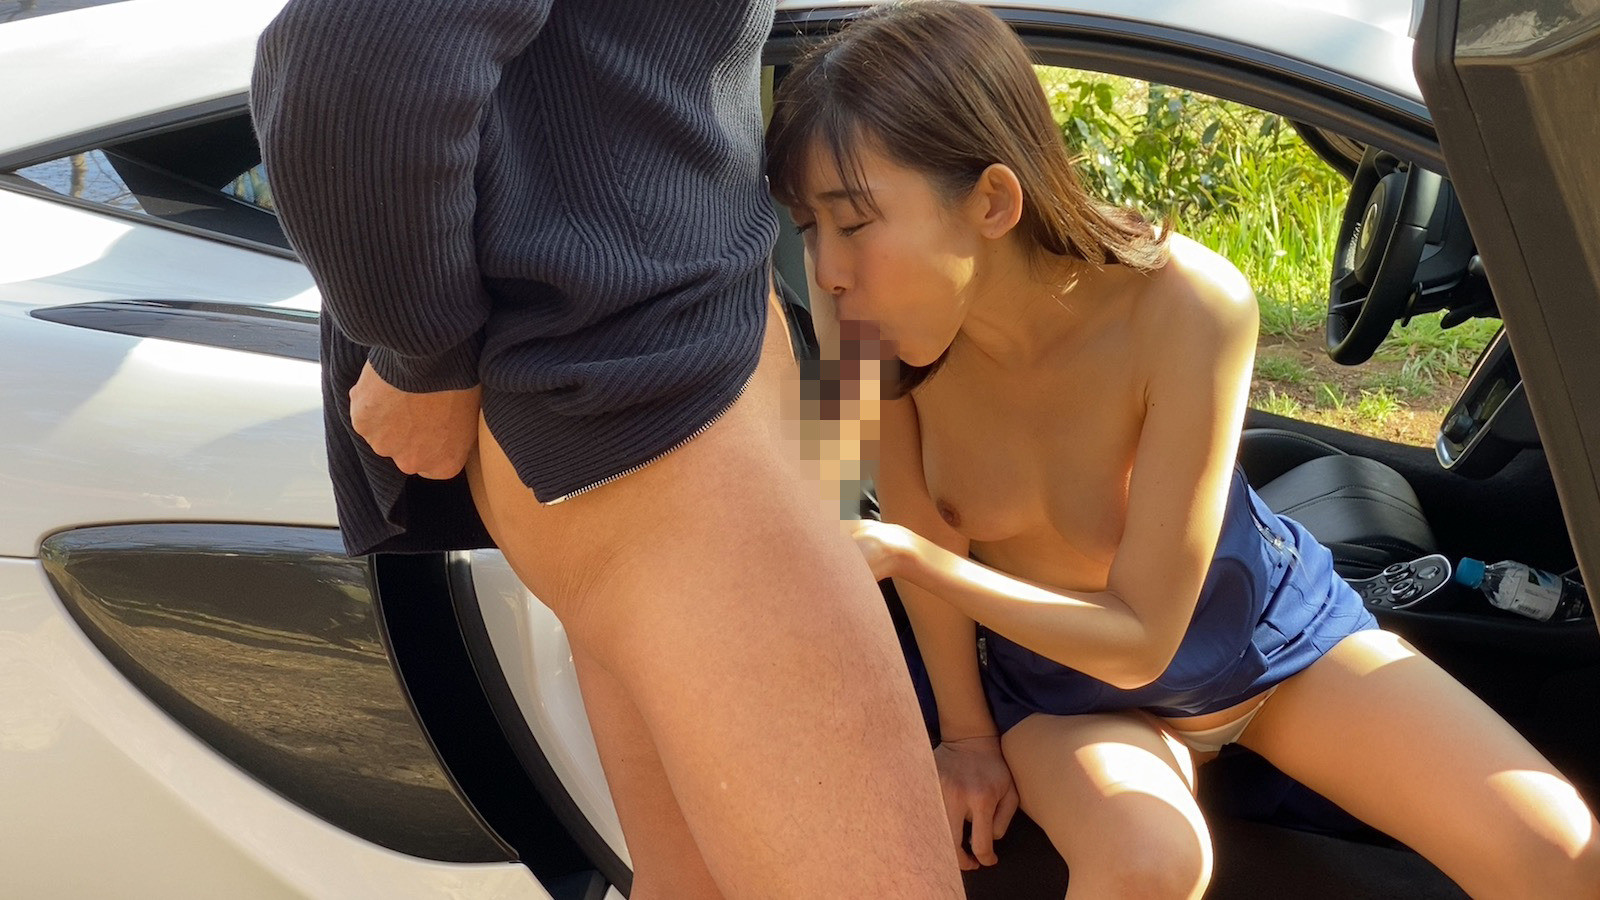 HIGH END CAR SEX 黒川すみれ 画像6